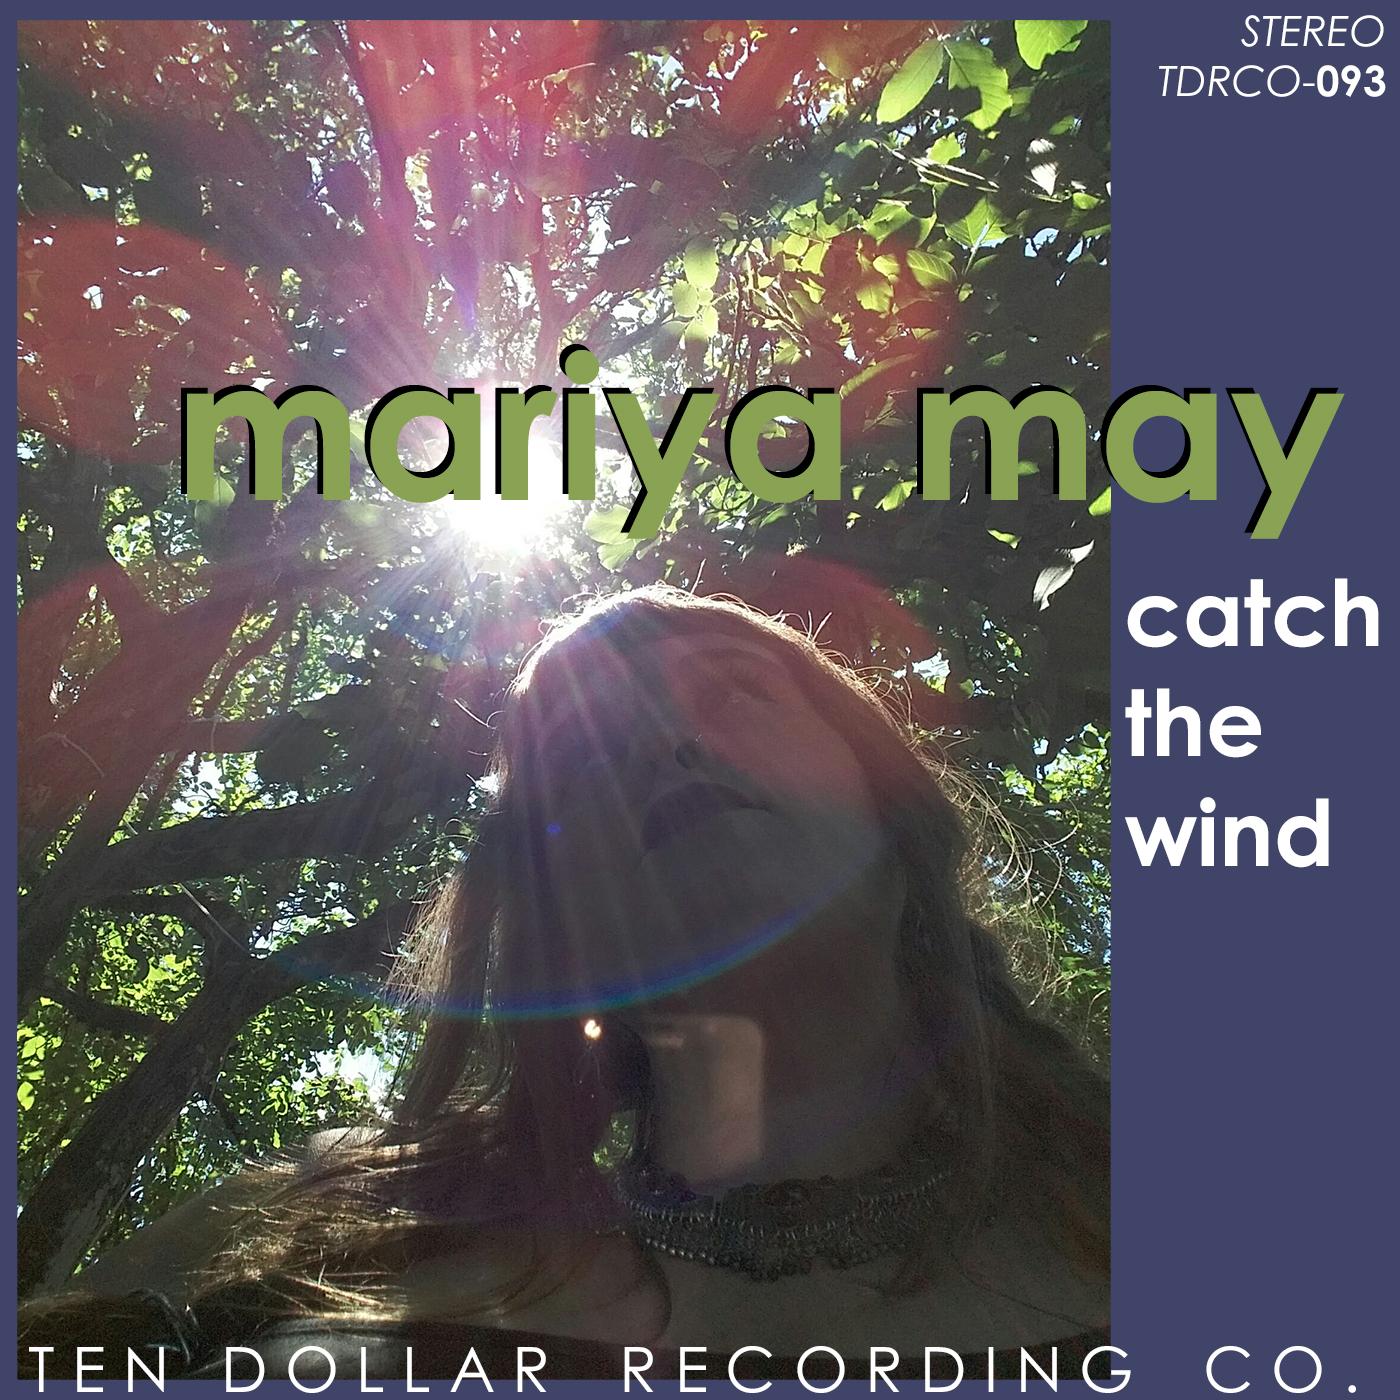 Mariya May - Catch The Wind (Single)